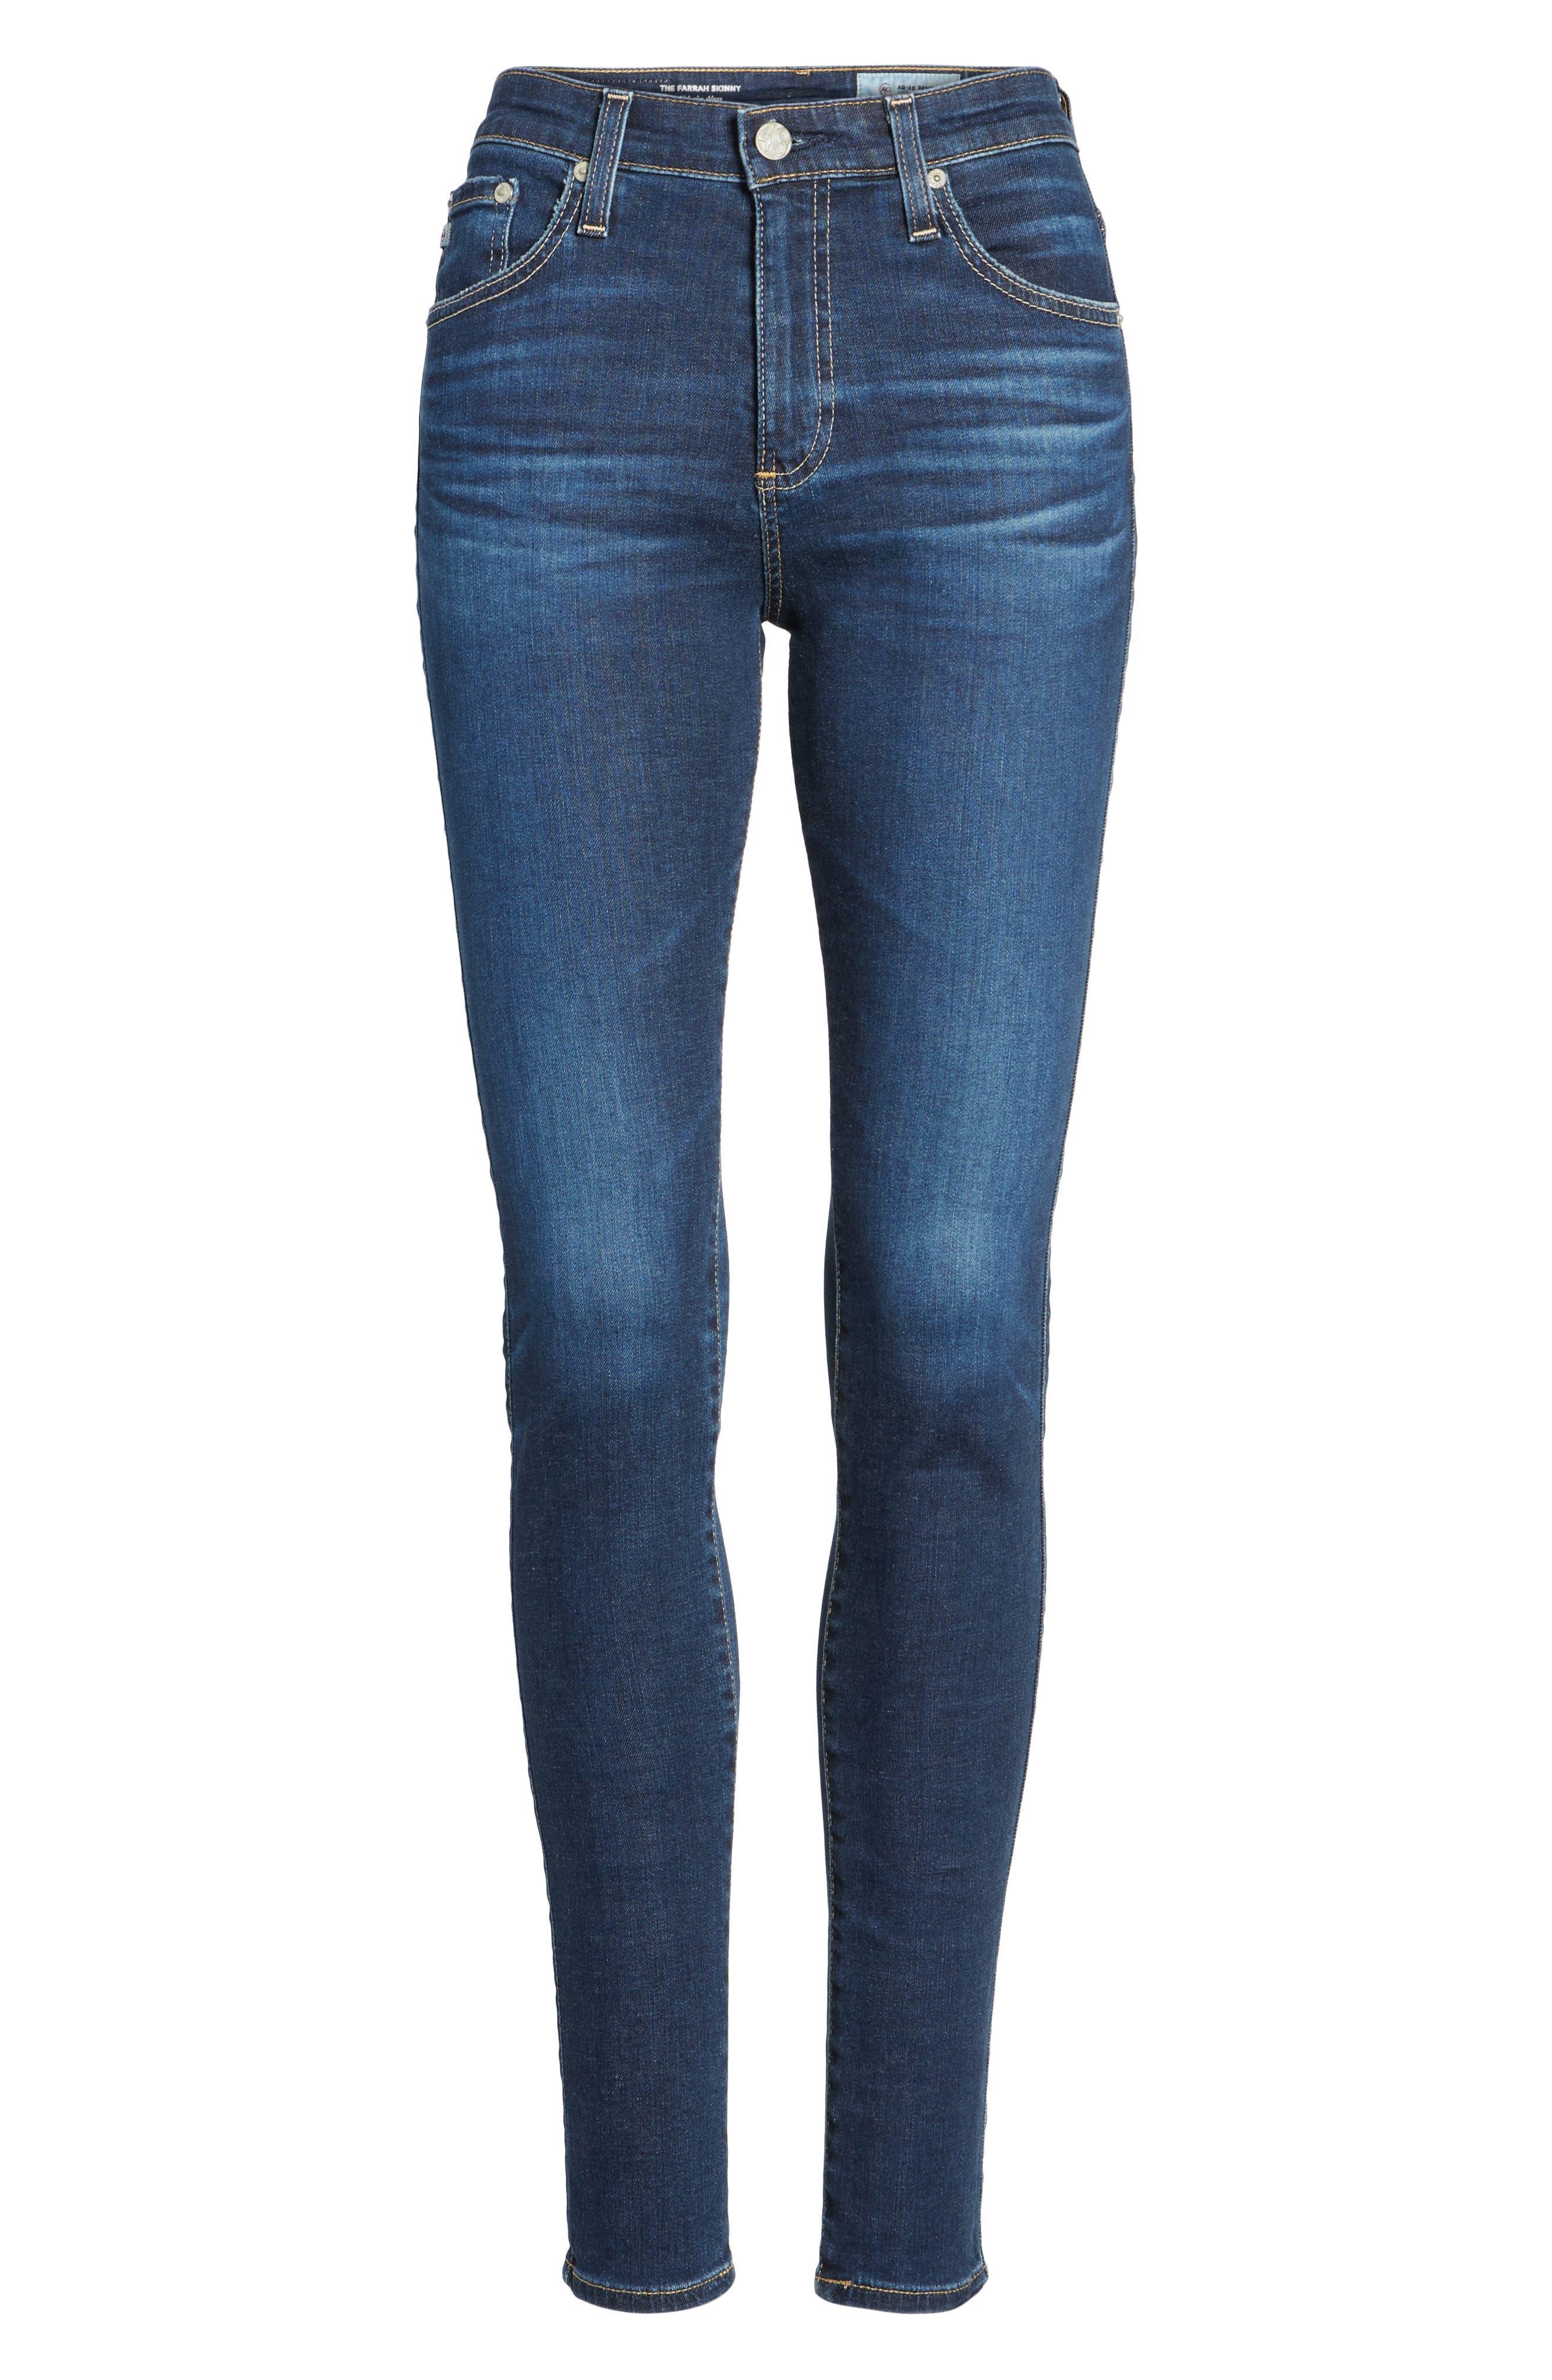 'The Farrah' High Rise Skinny Jeans,                             Alternate thumbnail 52, color,